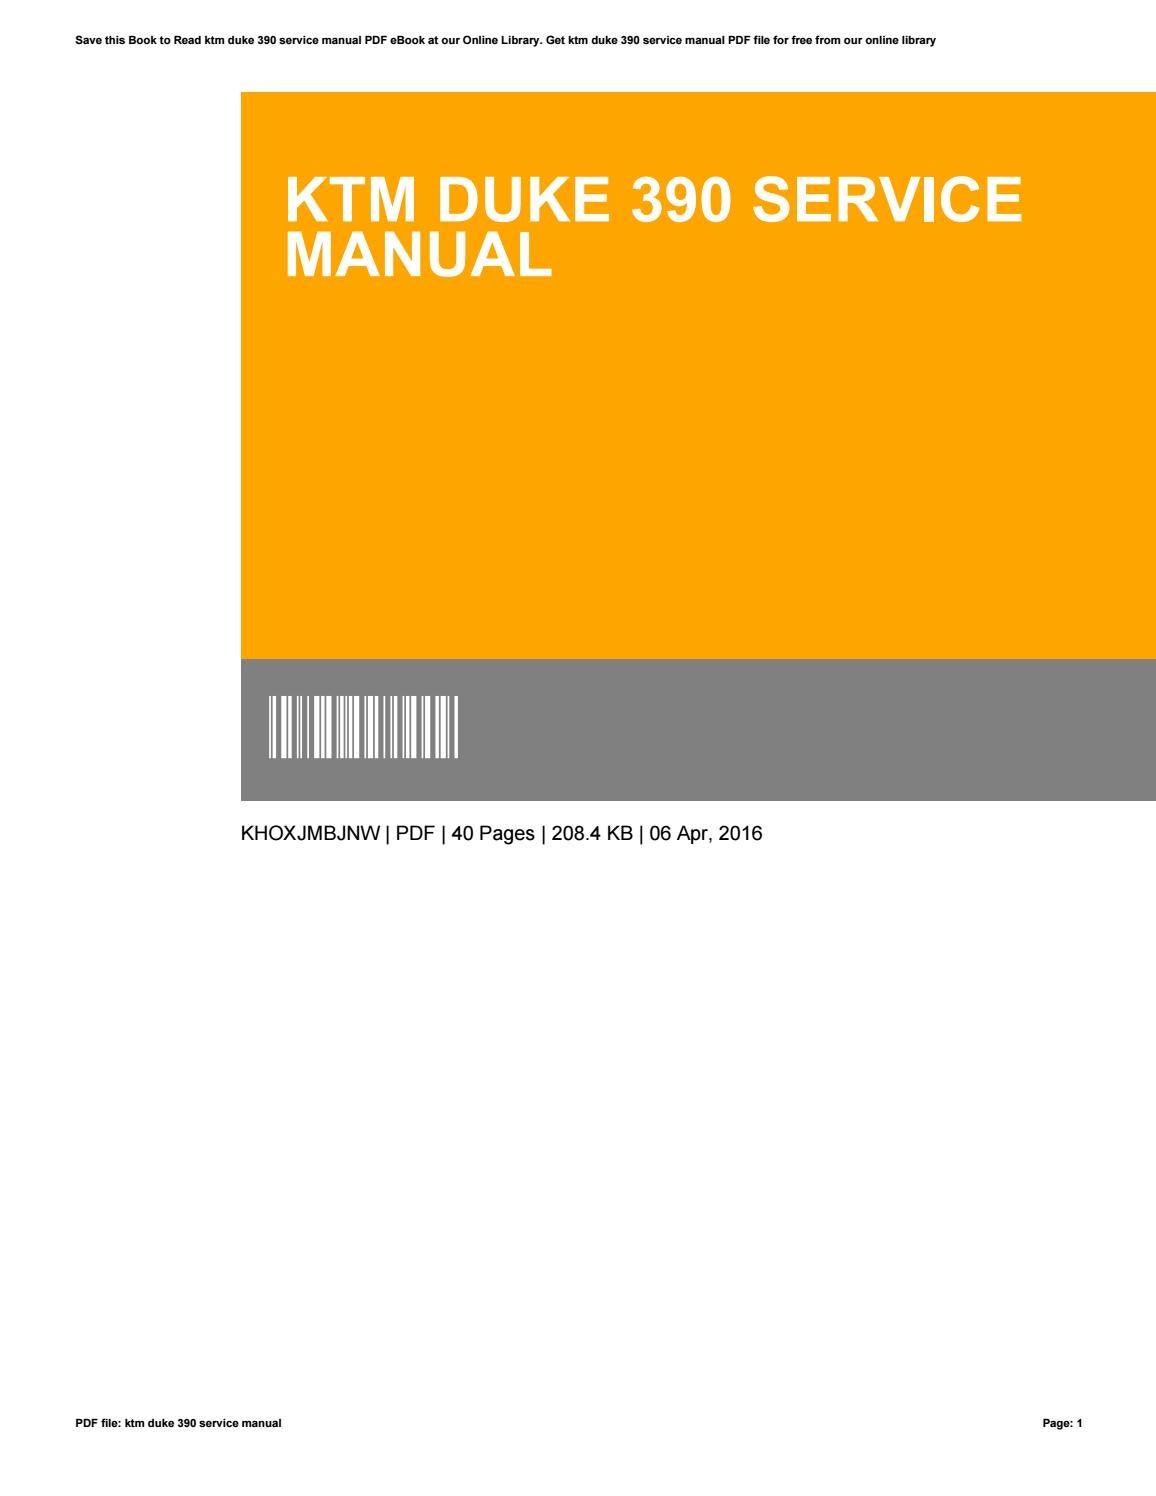 ktm rc 390 service manual pdf